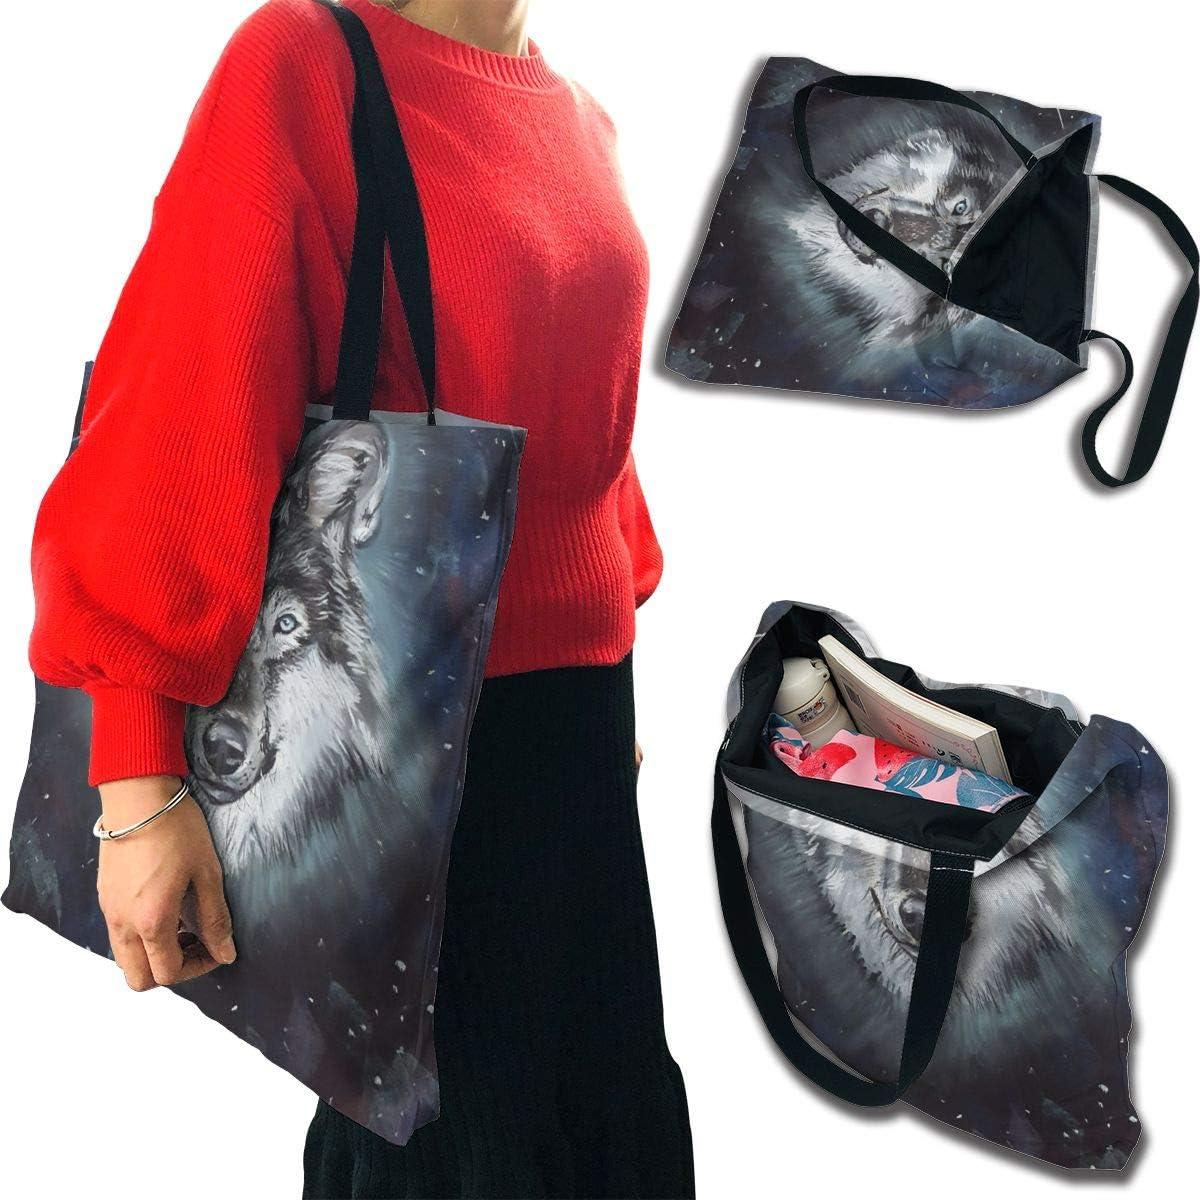 PengMin Retro Starry Wolf Fashion Womens Multi-Pocket Vintage Canvas Handbags Miniature Shoulder Bags Totes Purses Shopping Bags